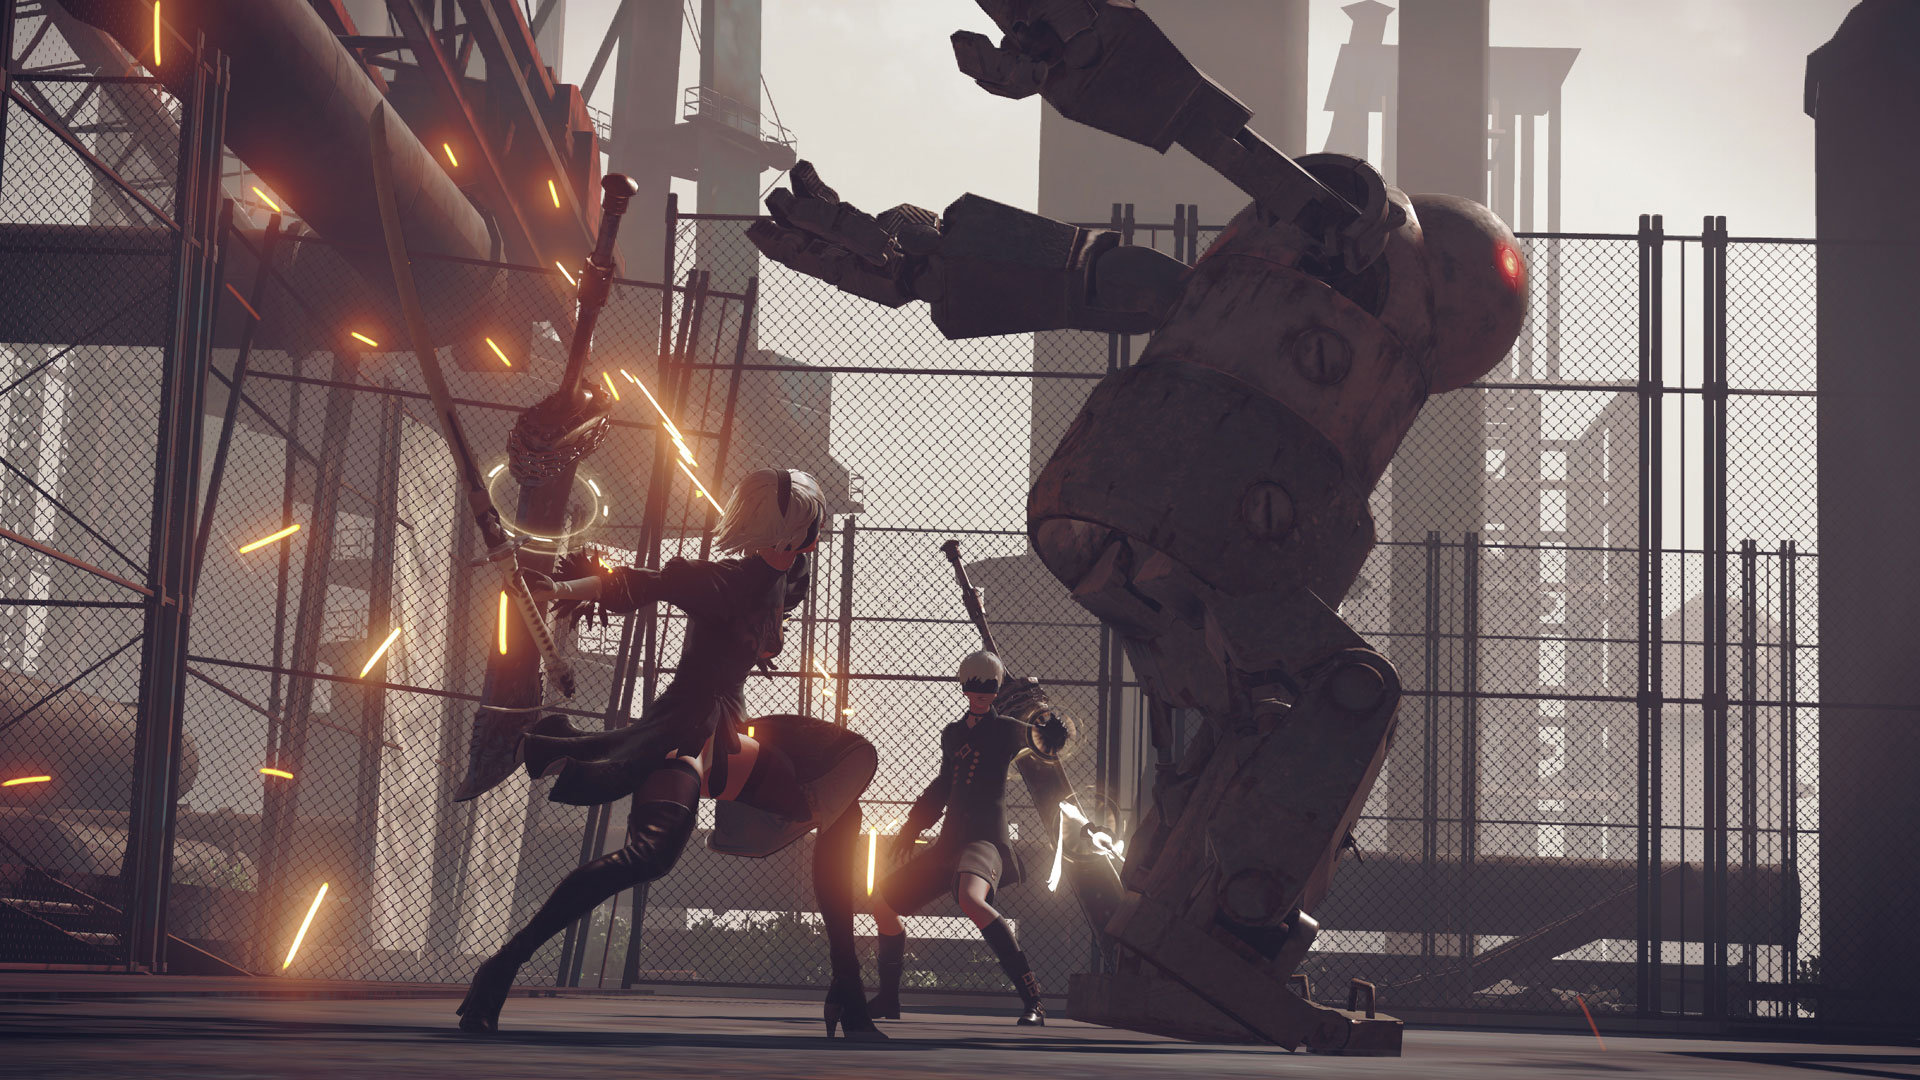 『NieR:Automata』ゲーム画面